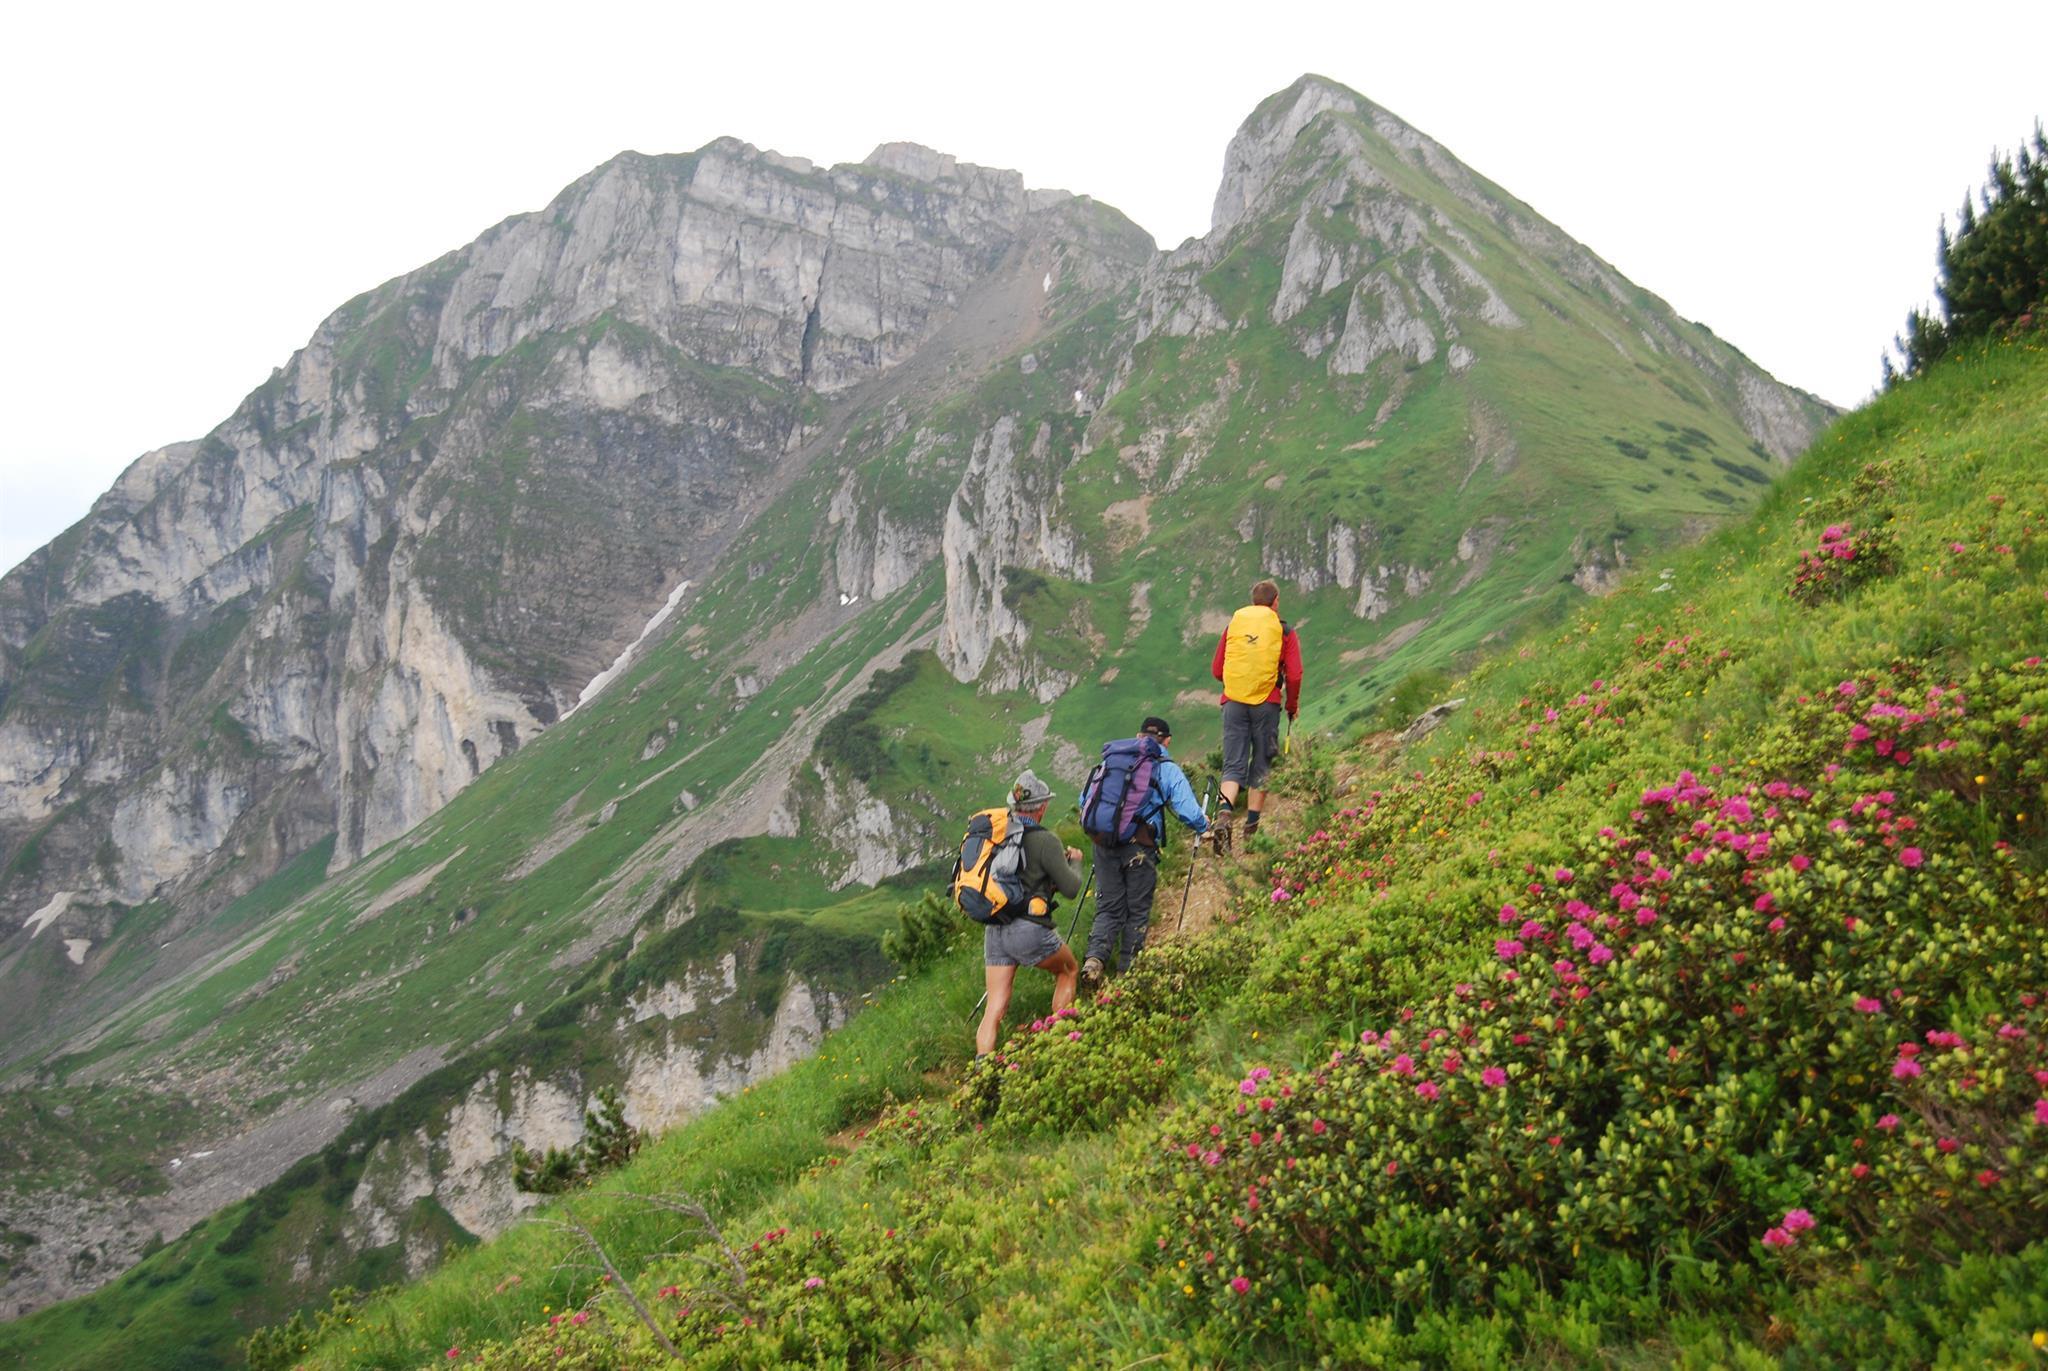 berg_gesund_hiking_tour_to_the_hollwand, Großarl